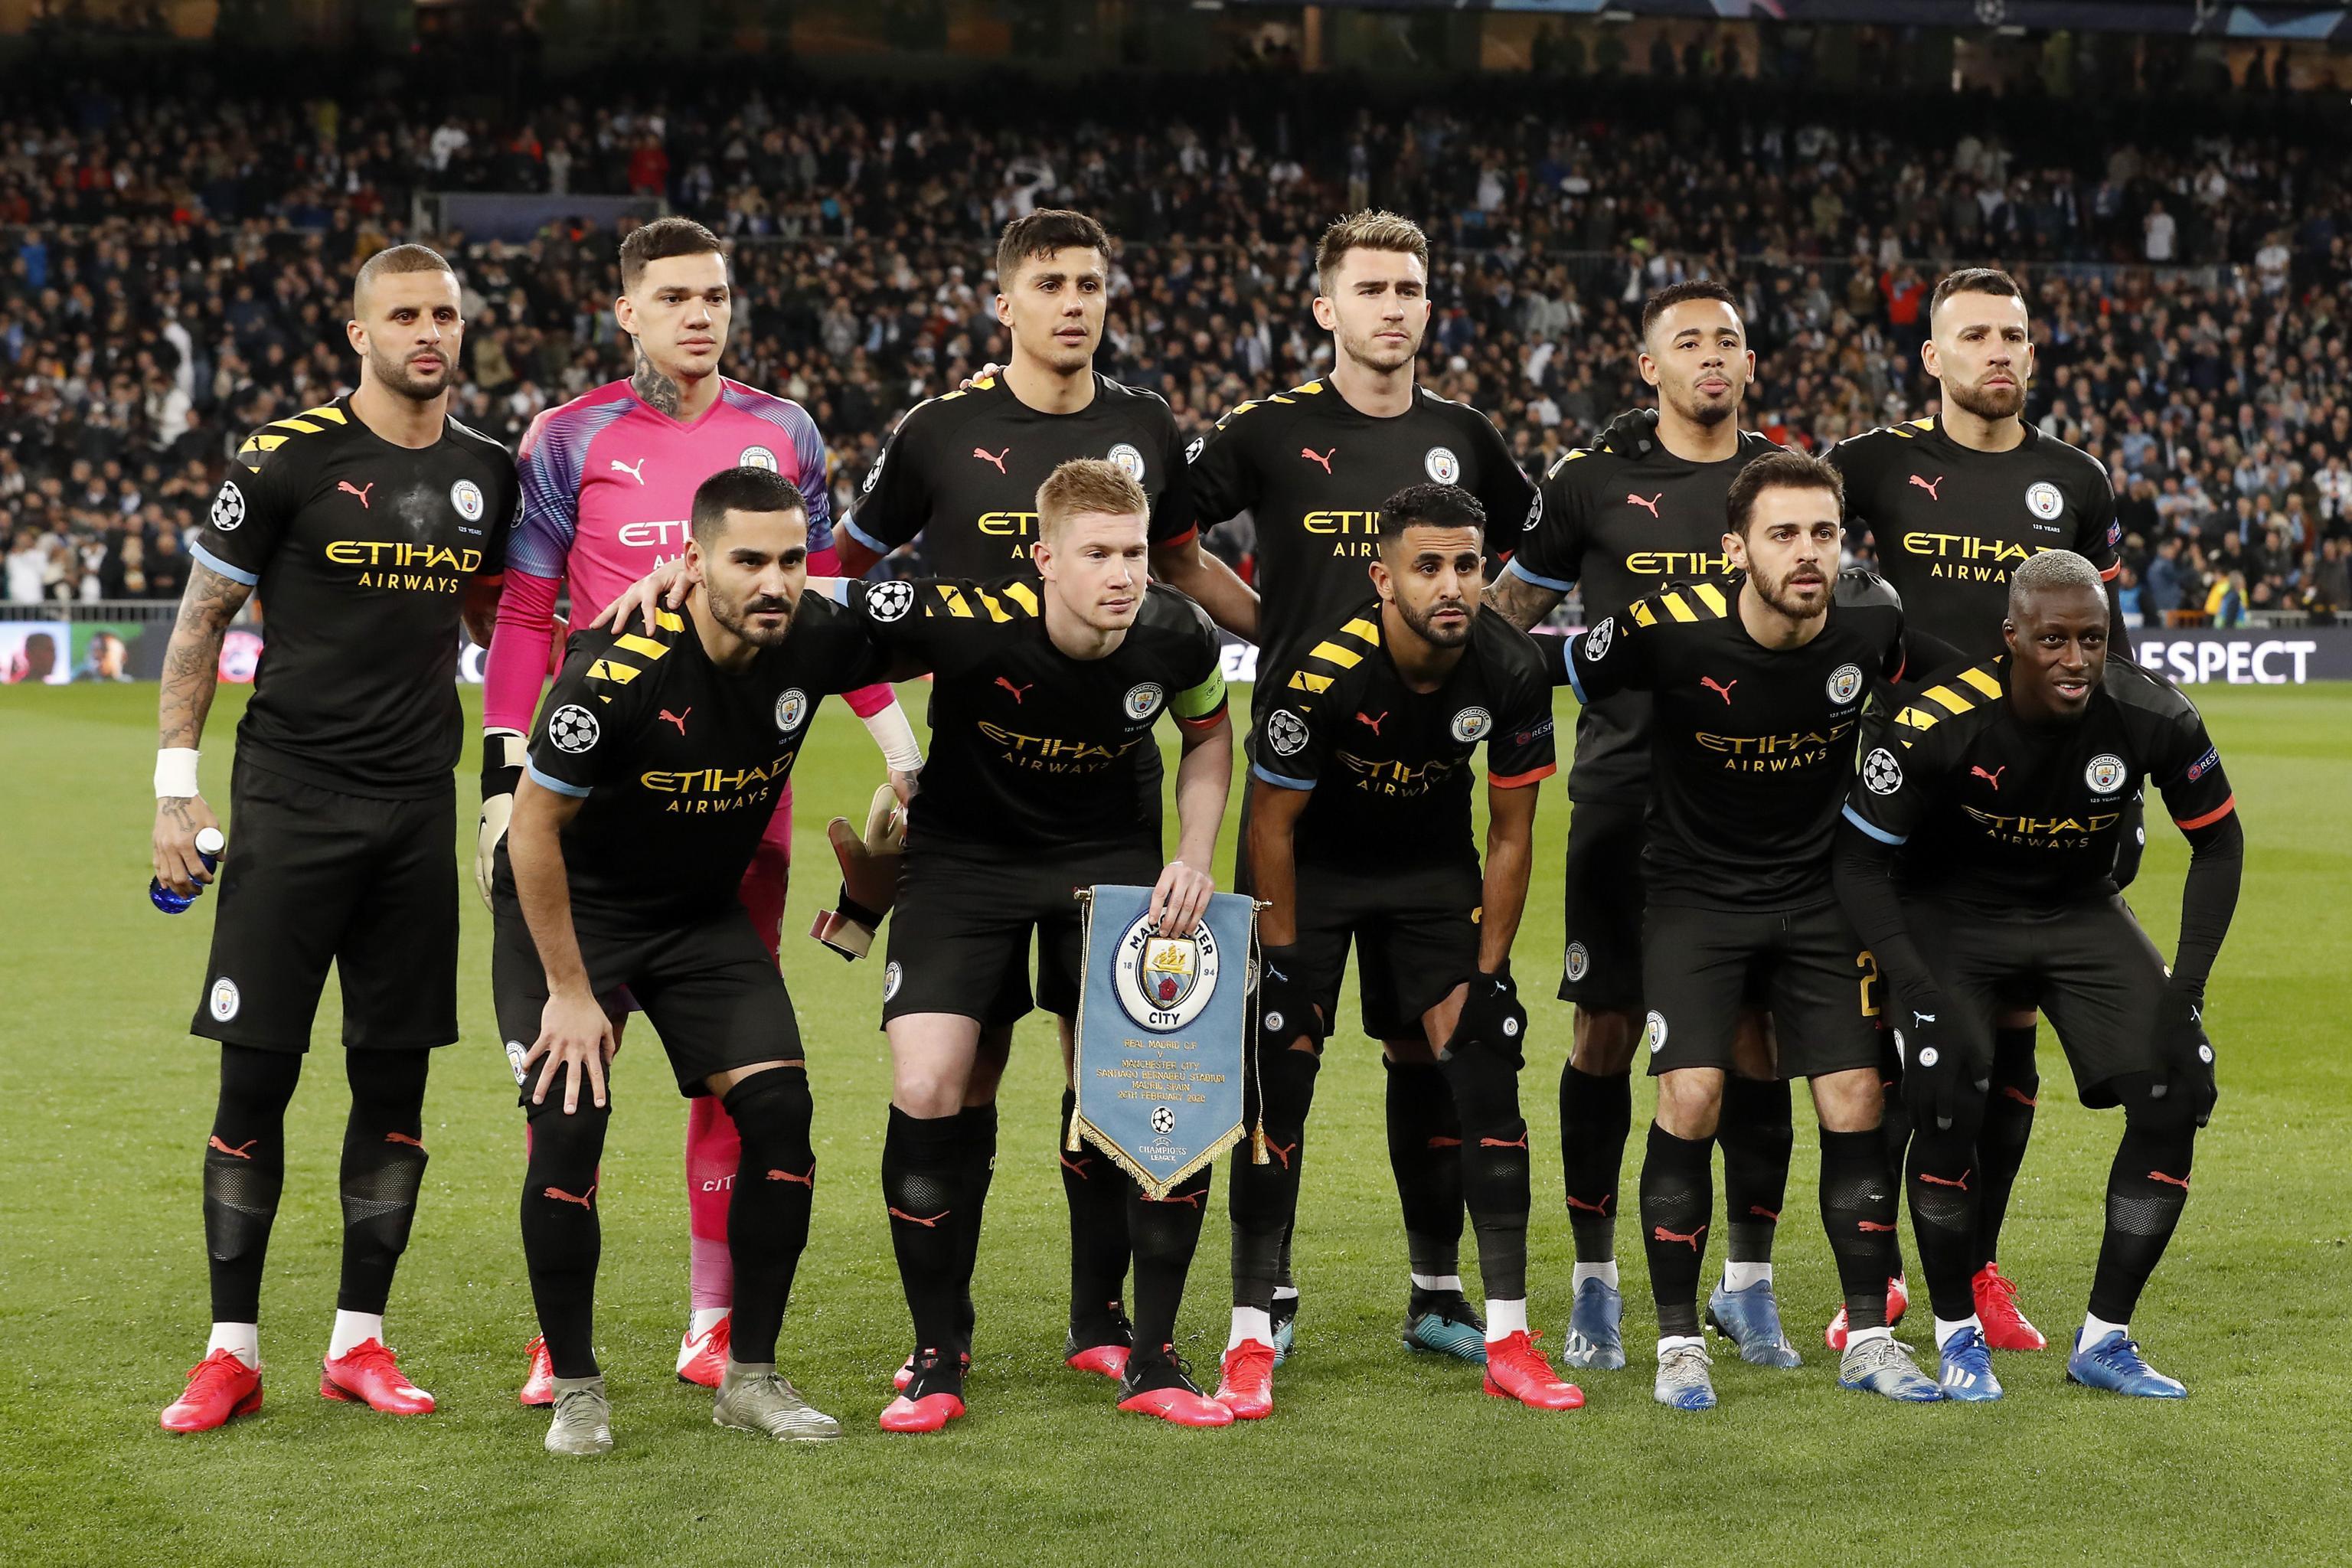 Man City Vs Real Madrid Juventus Vs Lyon Matches Postponed Amid Coronavirus Bleacher Report Latest News Videos And Highlights